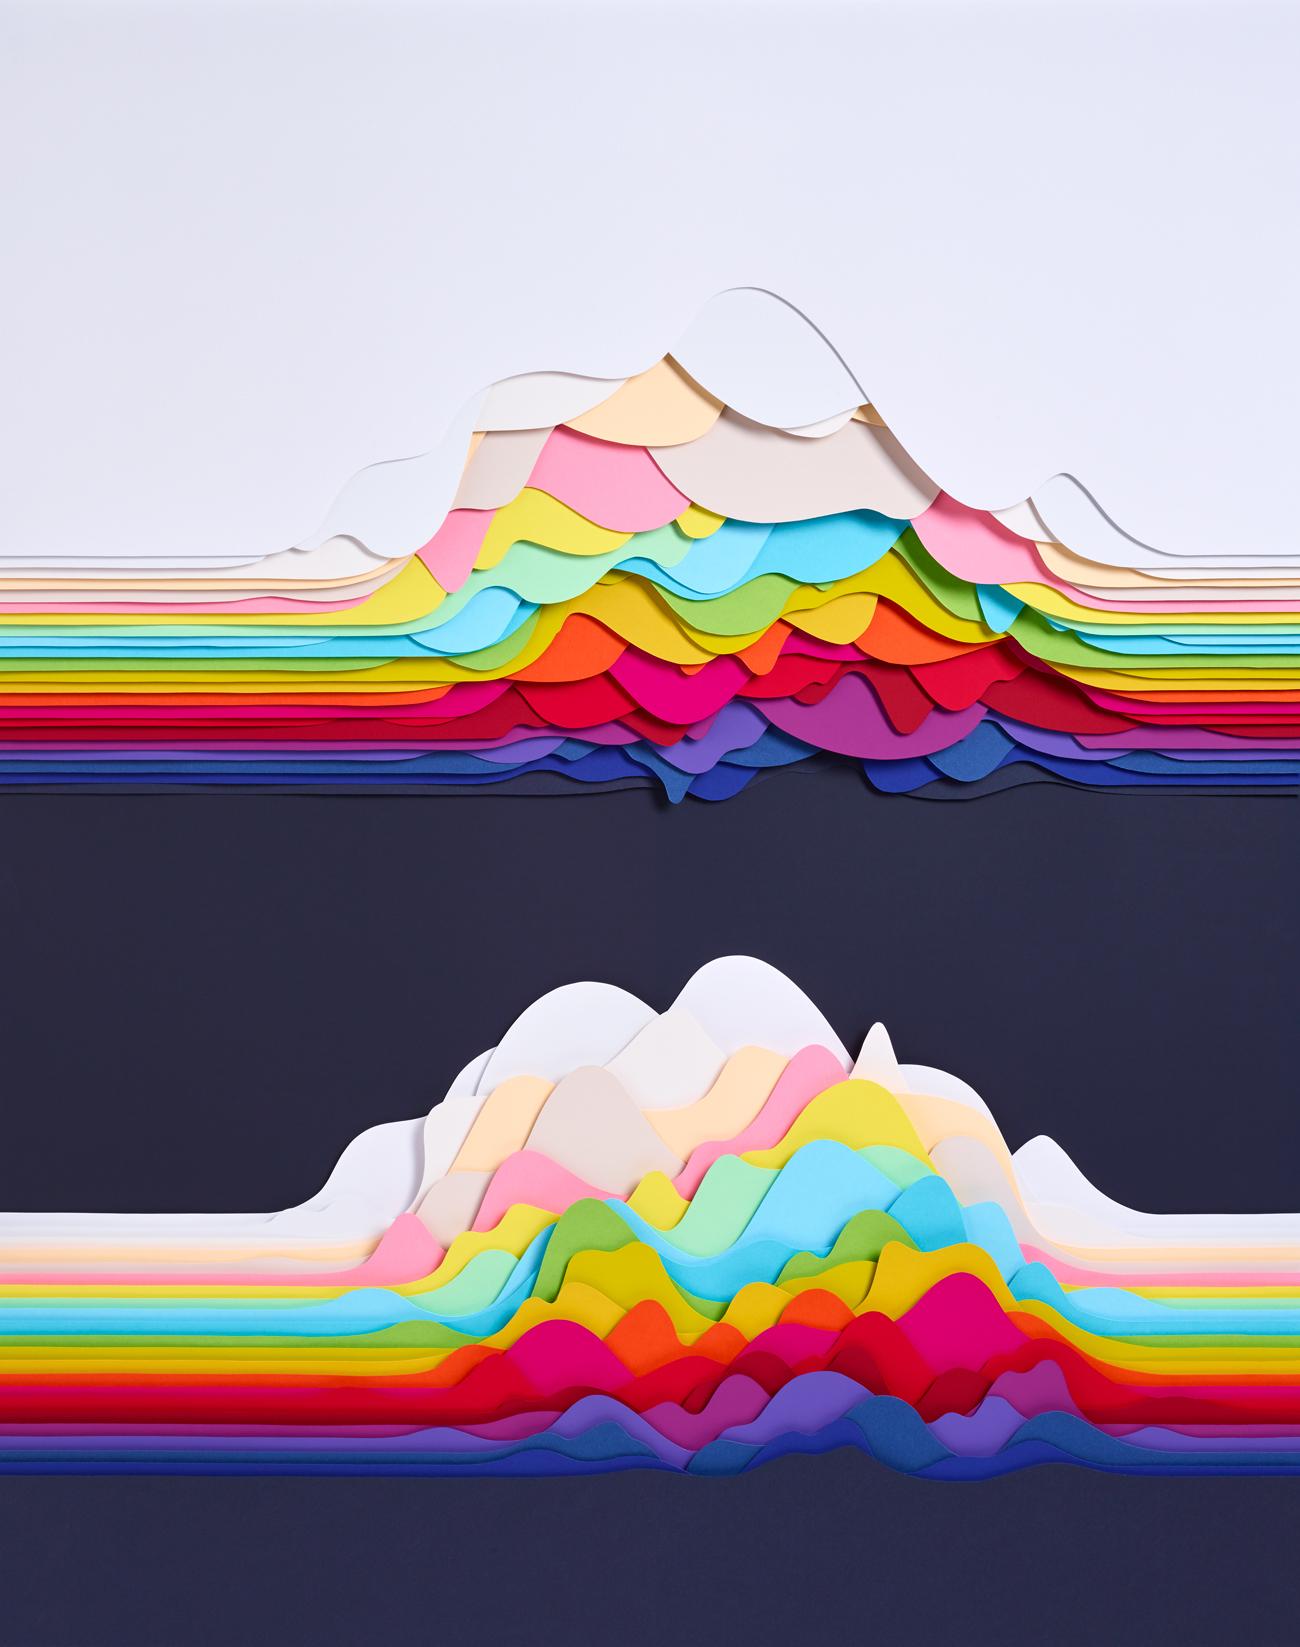 Maud-Vantours-Personal-work-Oscillations